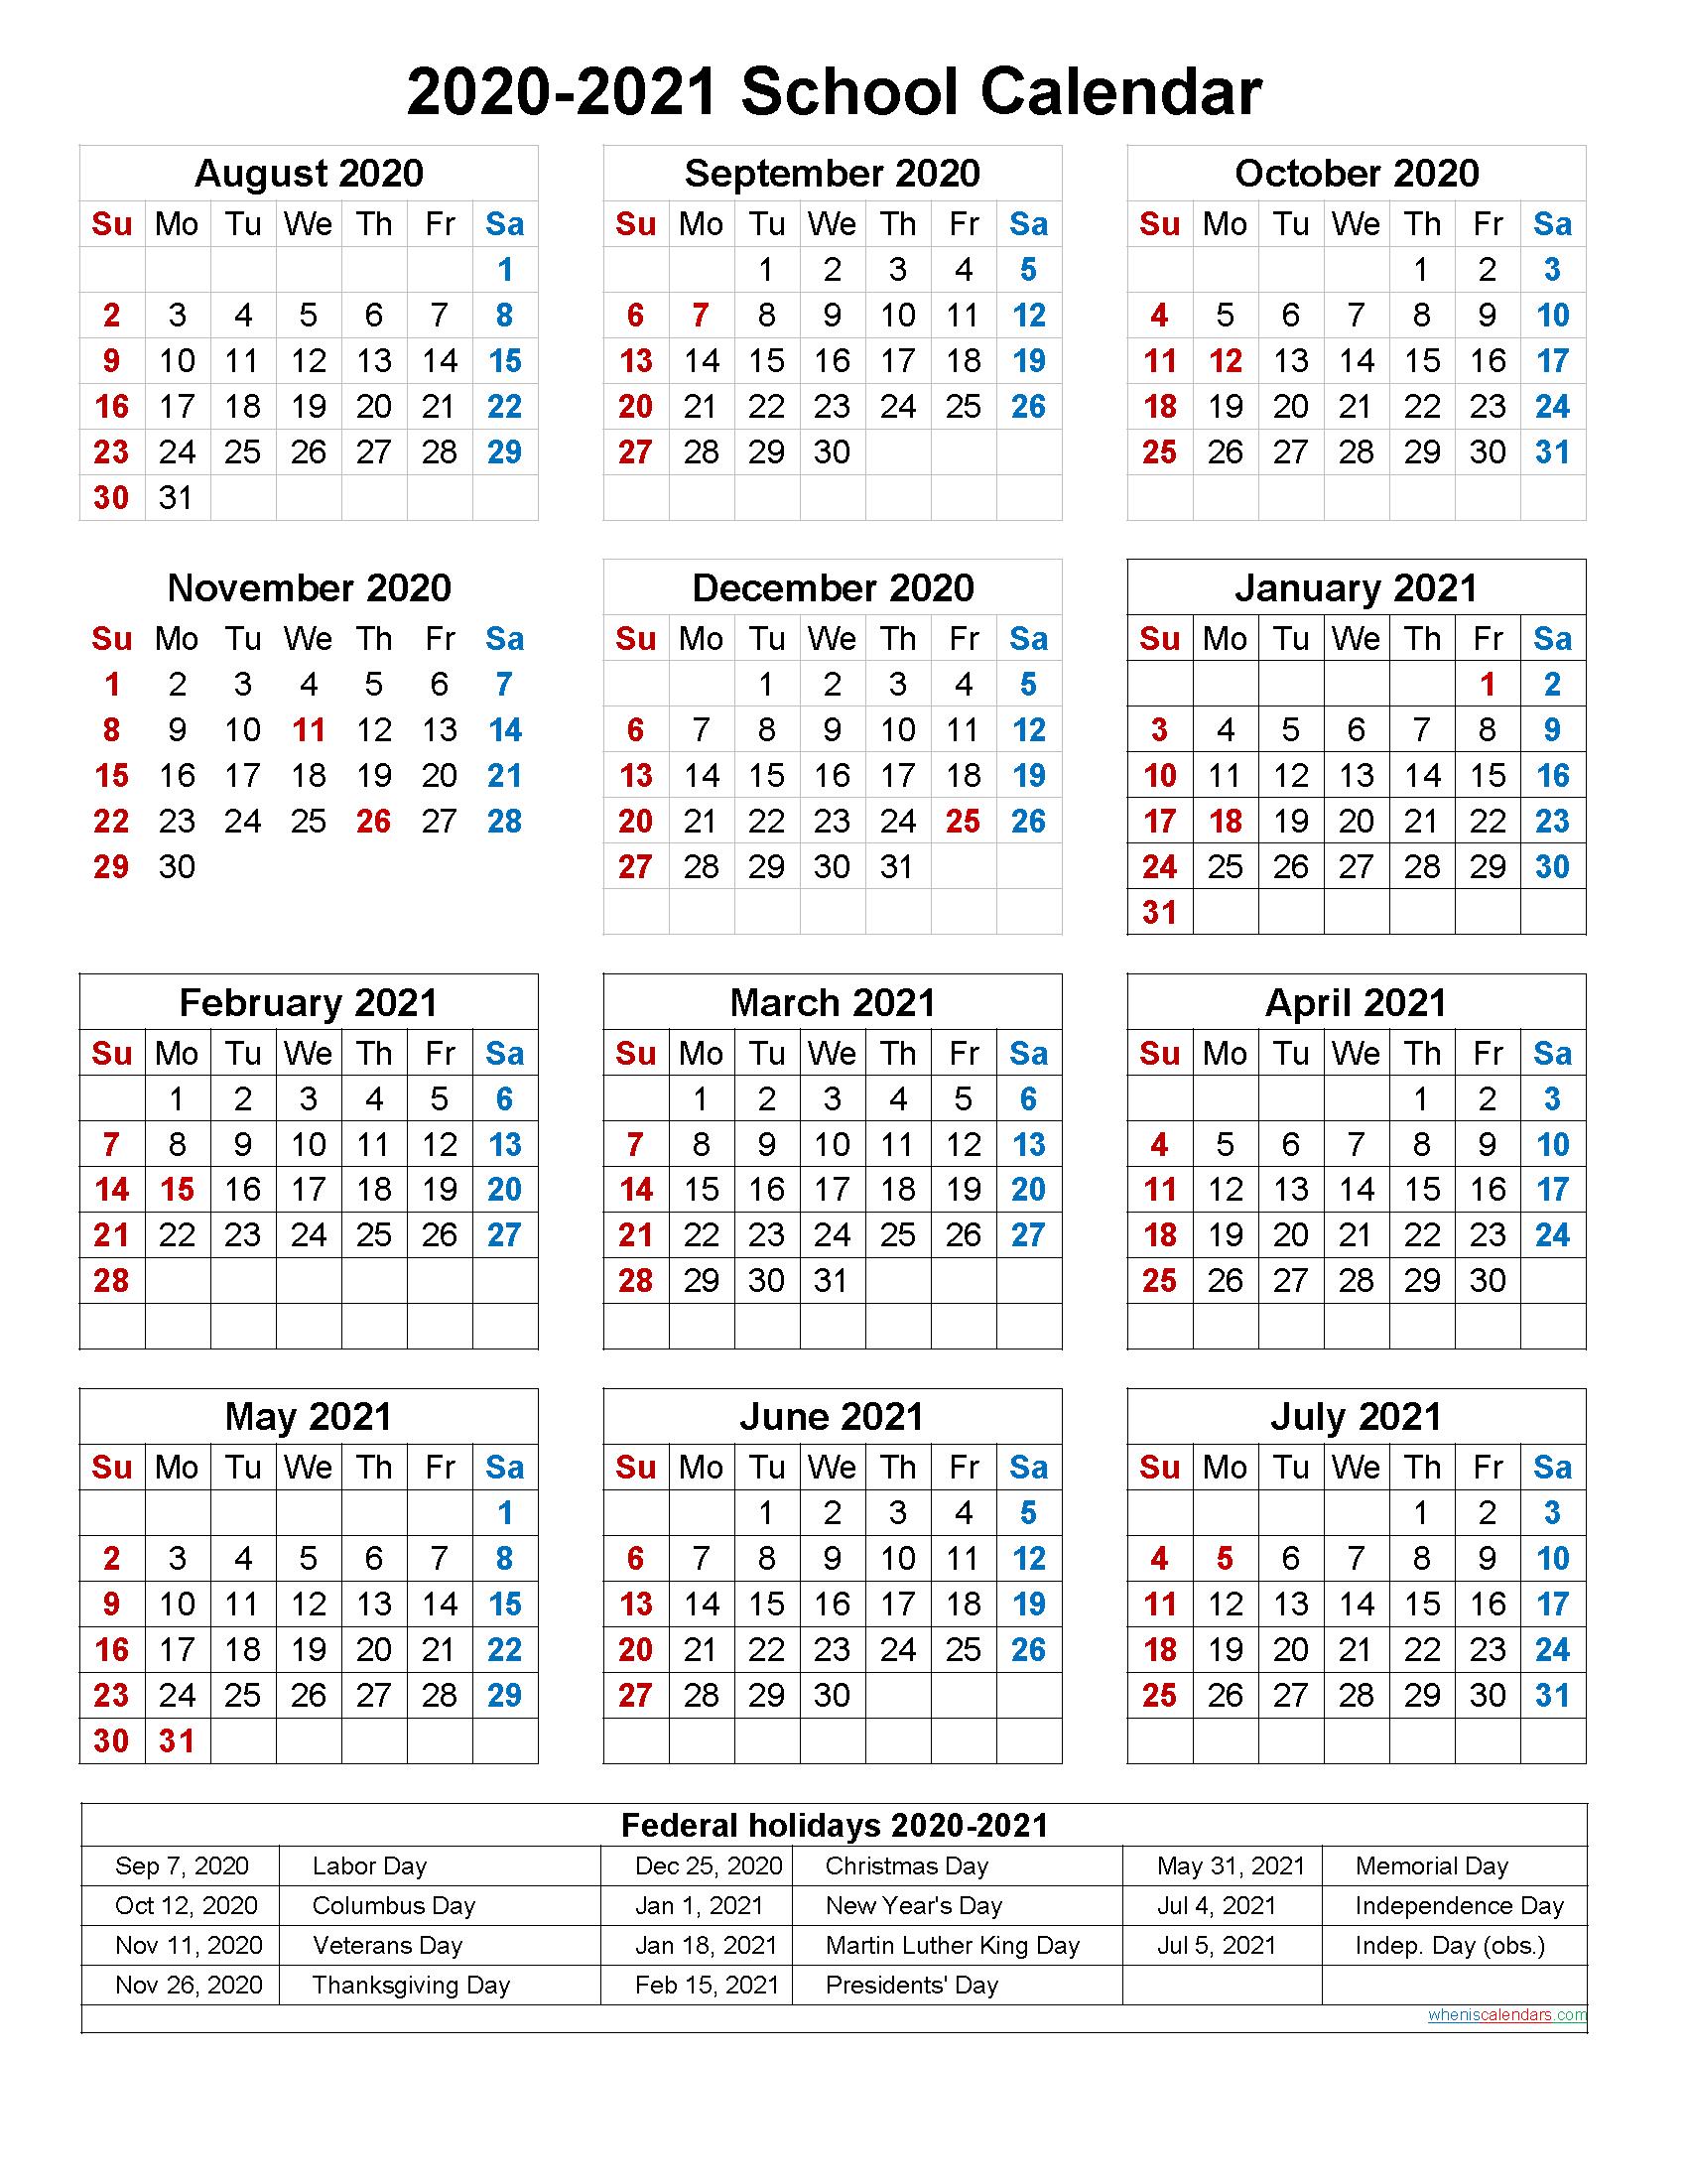 School Calendar 2020 And 2021 Printable (Portrait)  Template For Printable 2020 2021 School Calendar